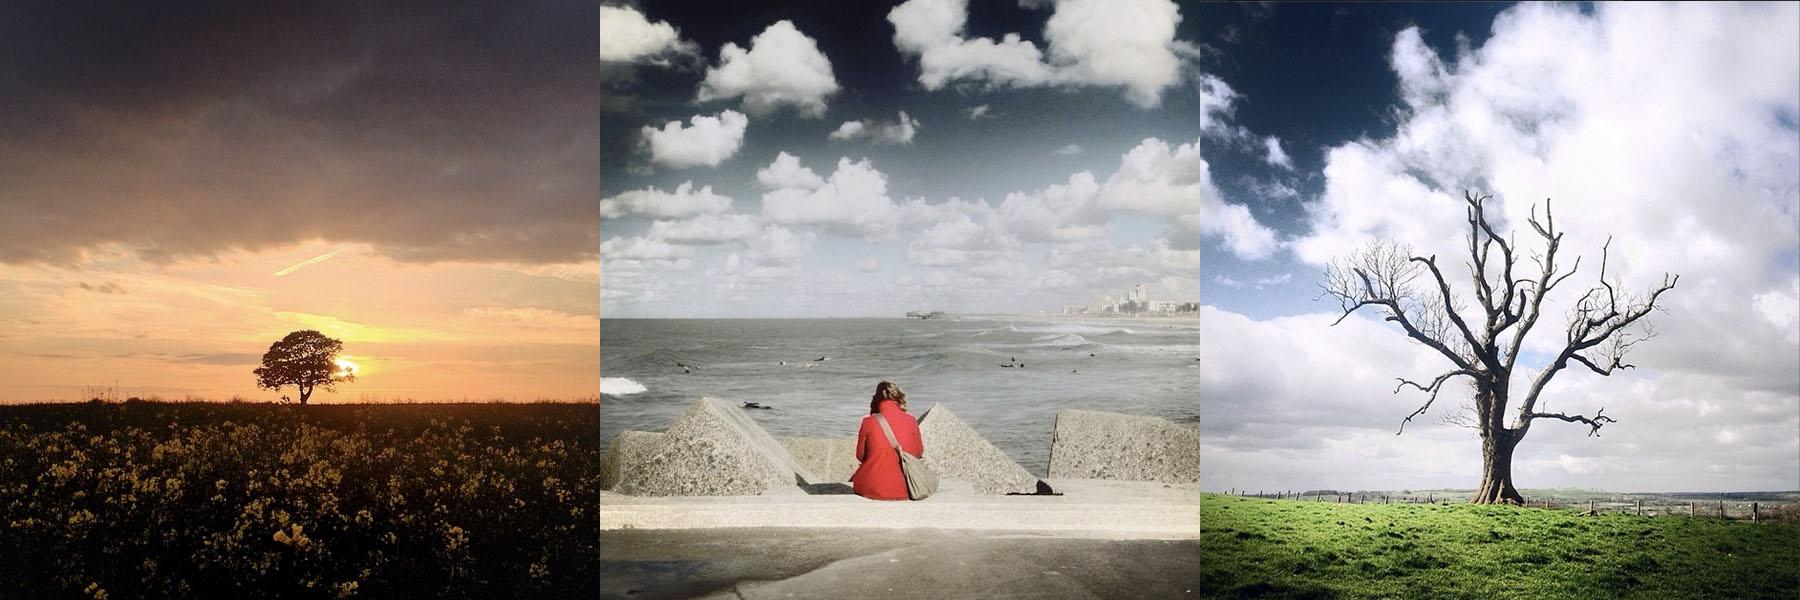 nederlandse instagram fotografen claireonline